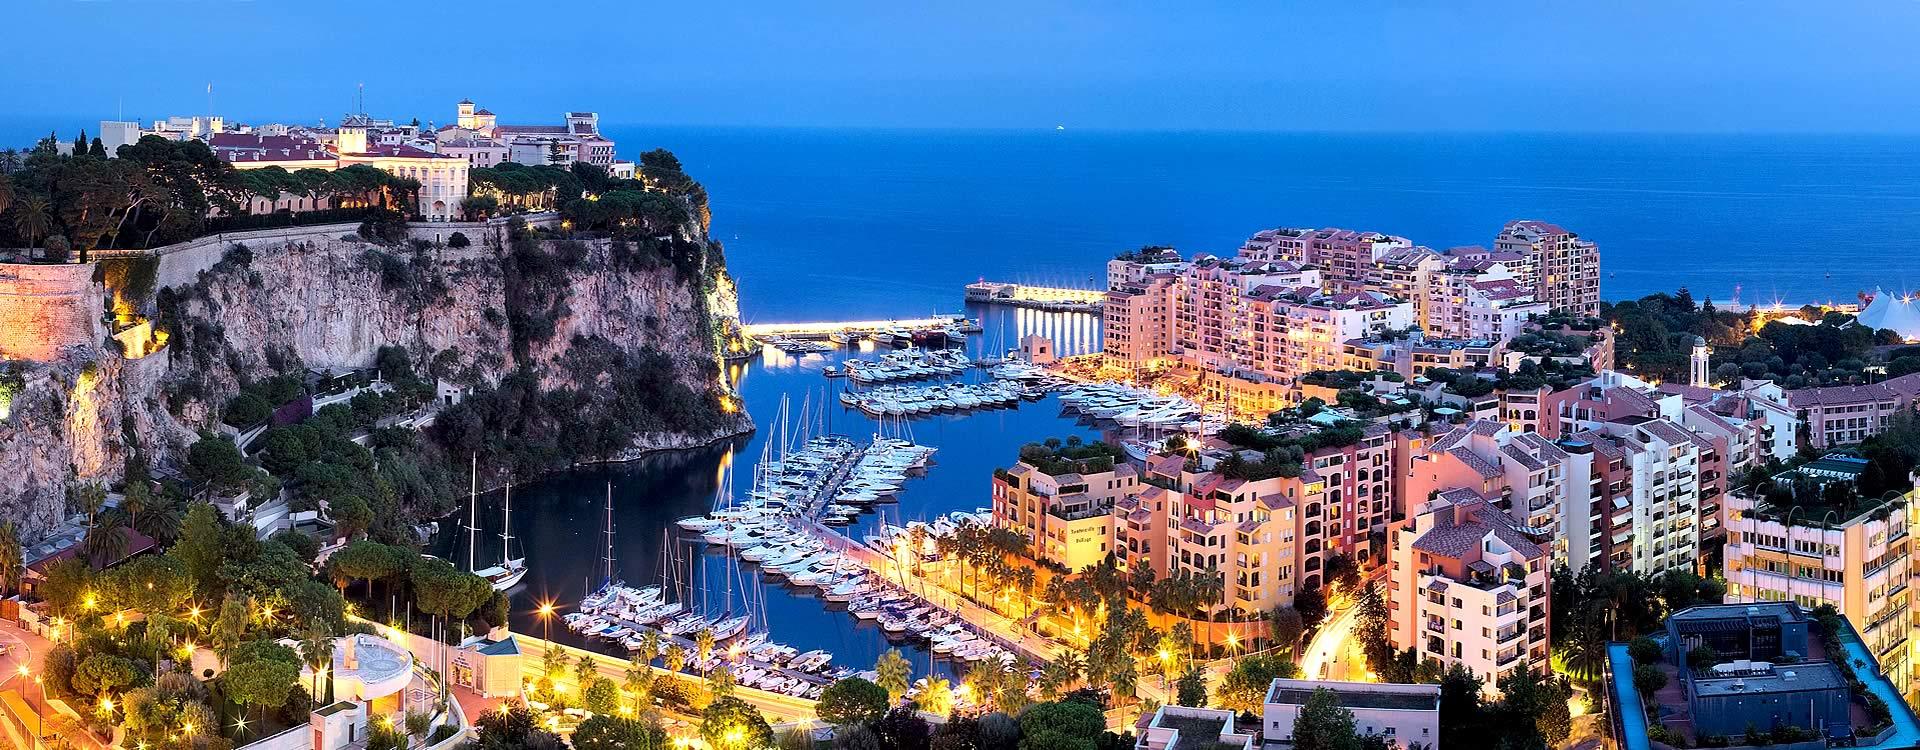 Monaco Fontvielle